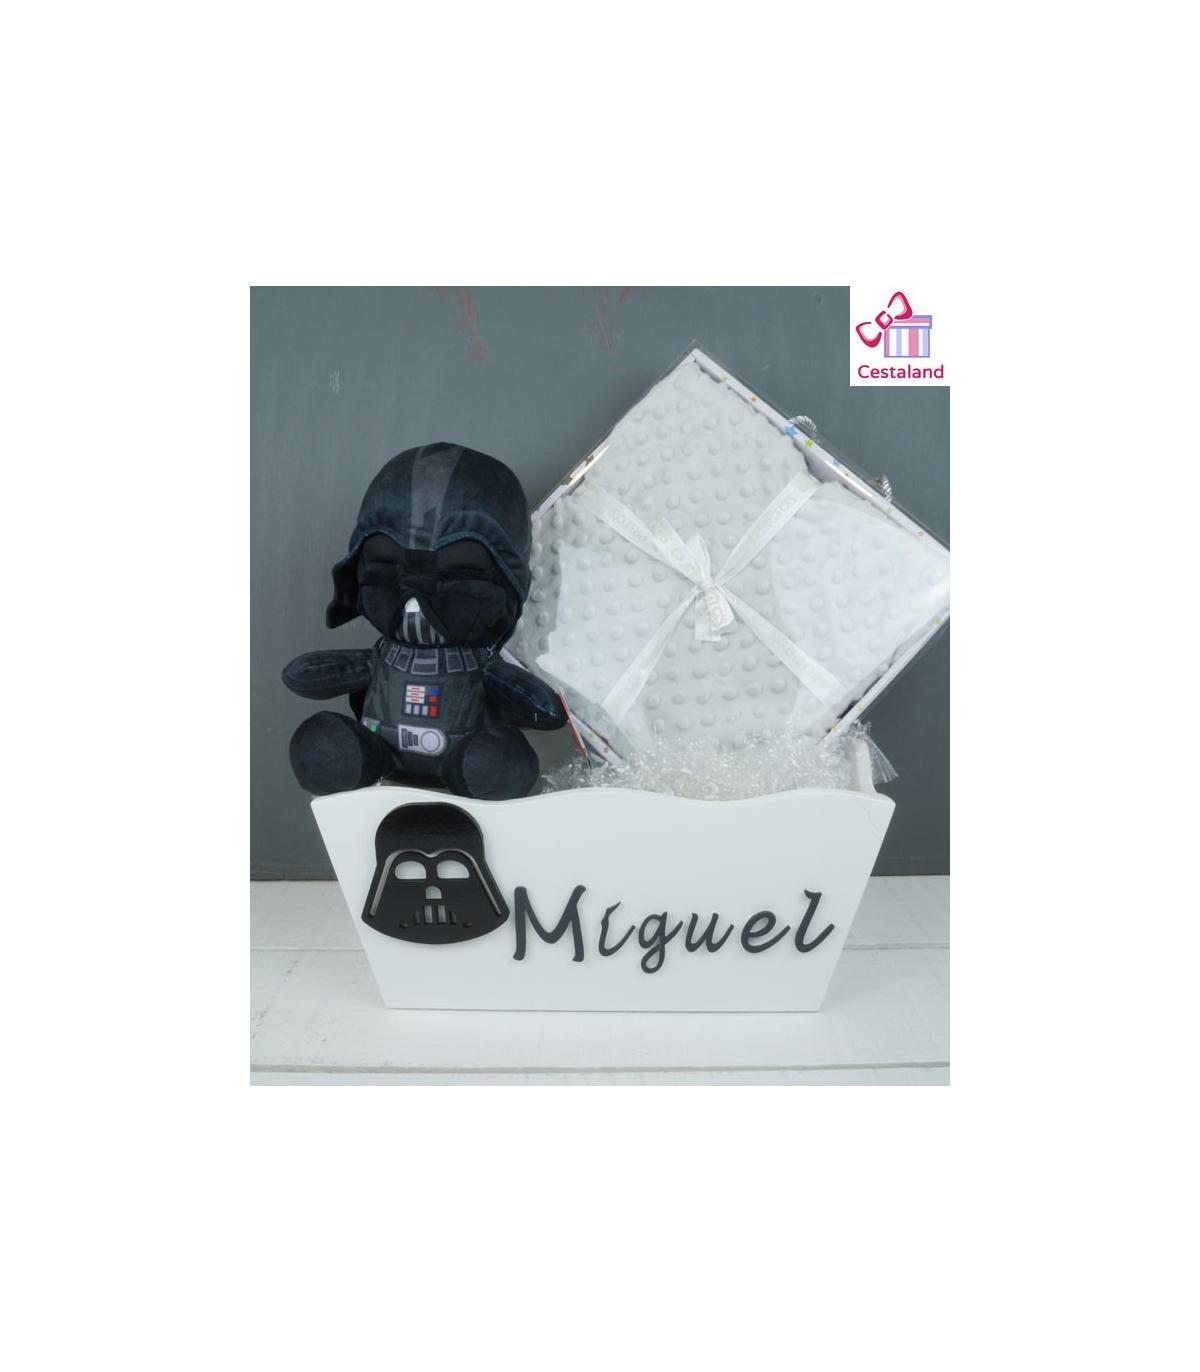 Cosas Frikis Para Bebes.Caja Personalizada Star Wars Para Bebe Regalos Frikis Star Wars Para Bebes